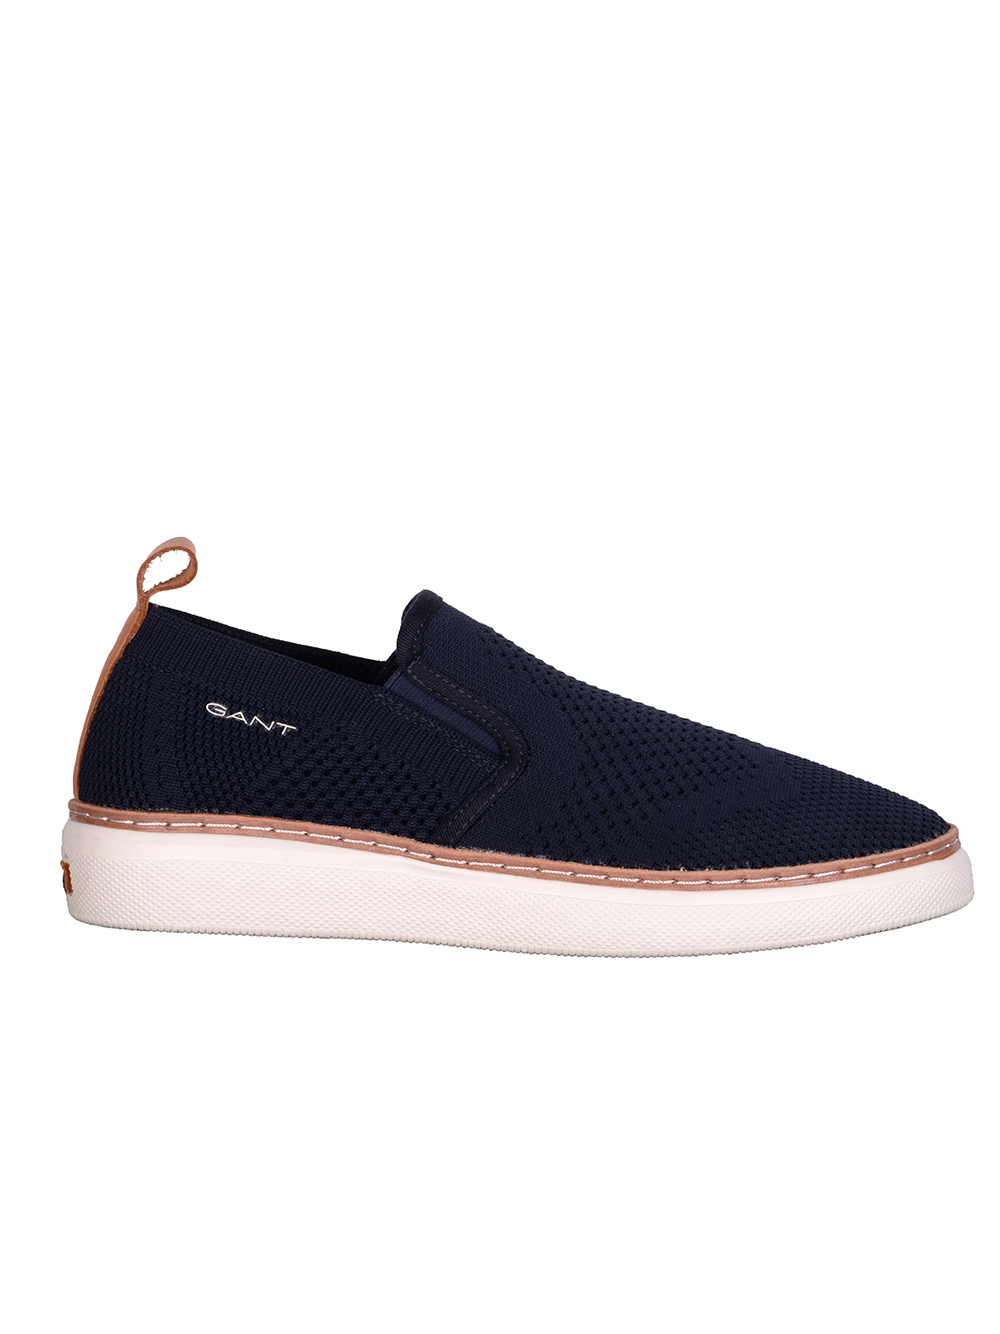 GANT Παπούτσια 3GS22637676-9 ΜΠΛΕ